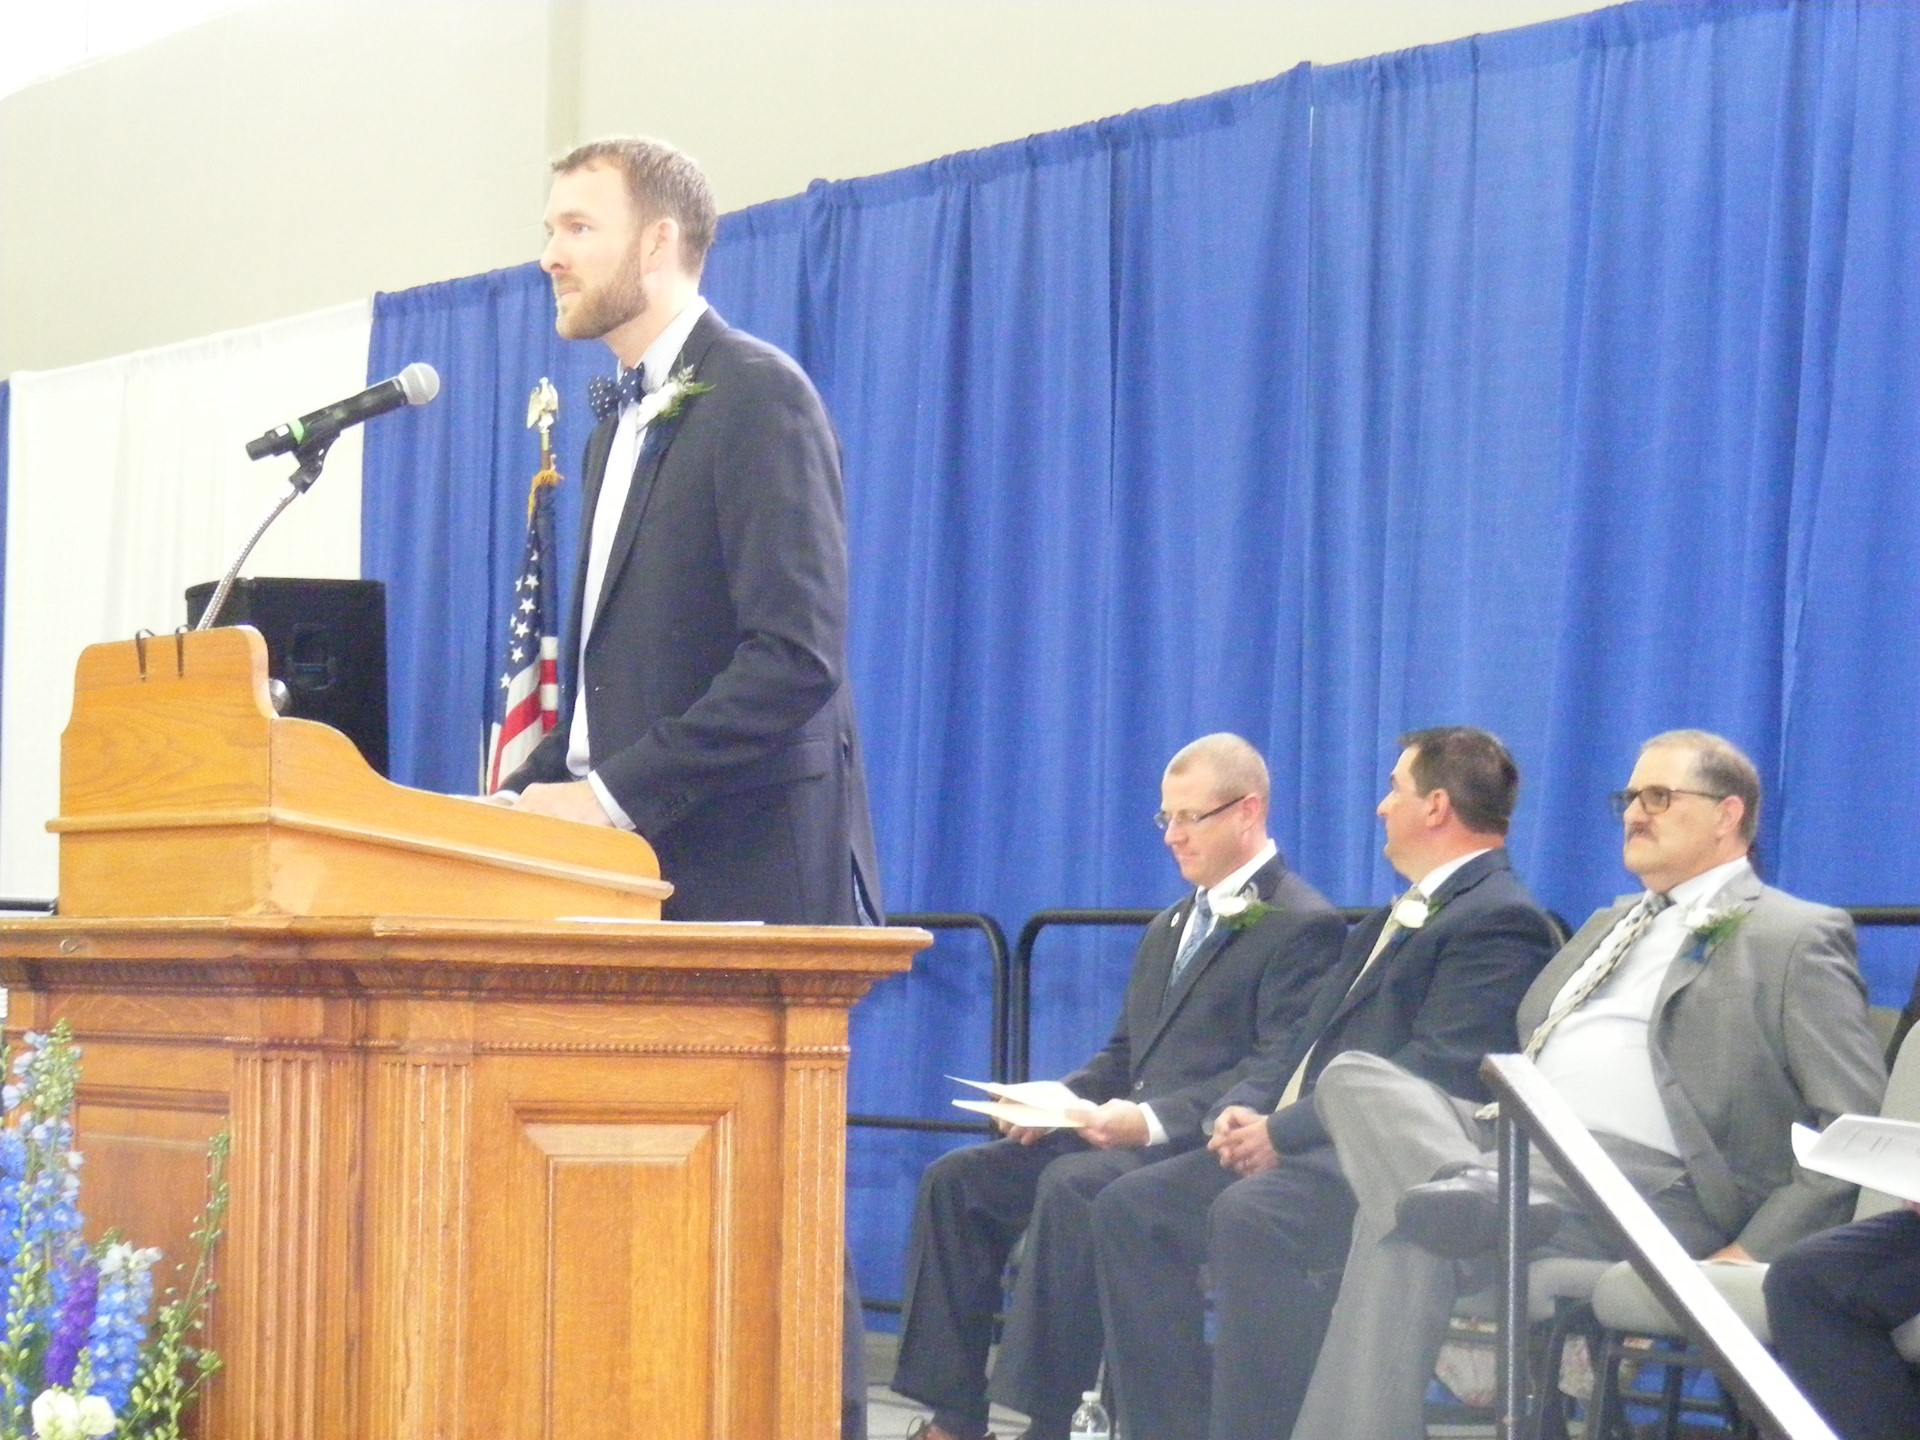 Principal Matt Durst Welcomes Guests & Grads